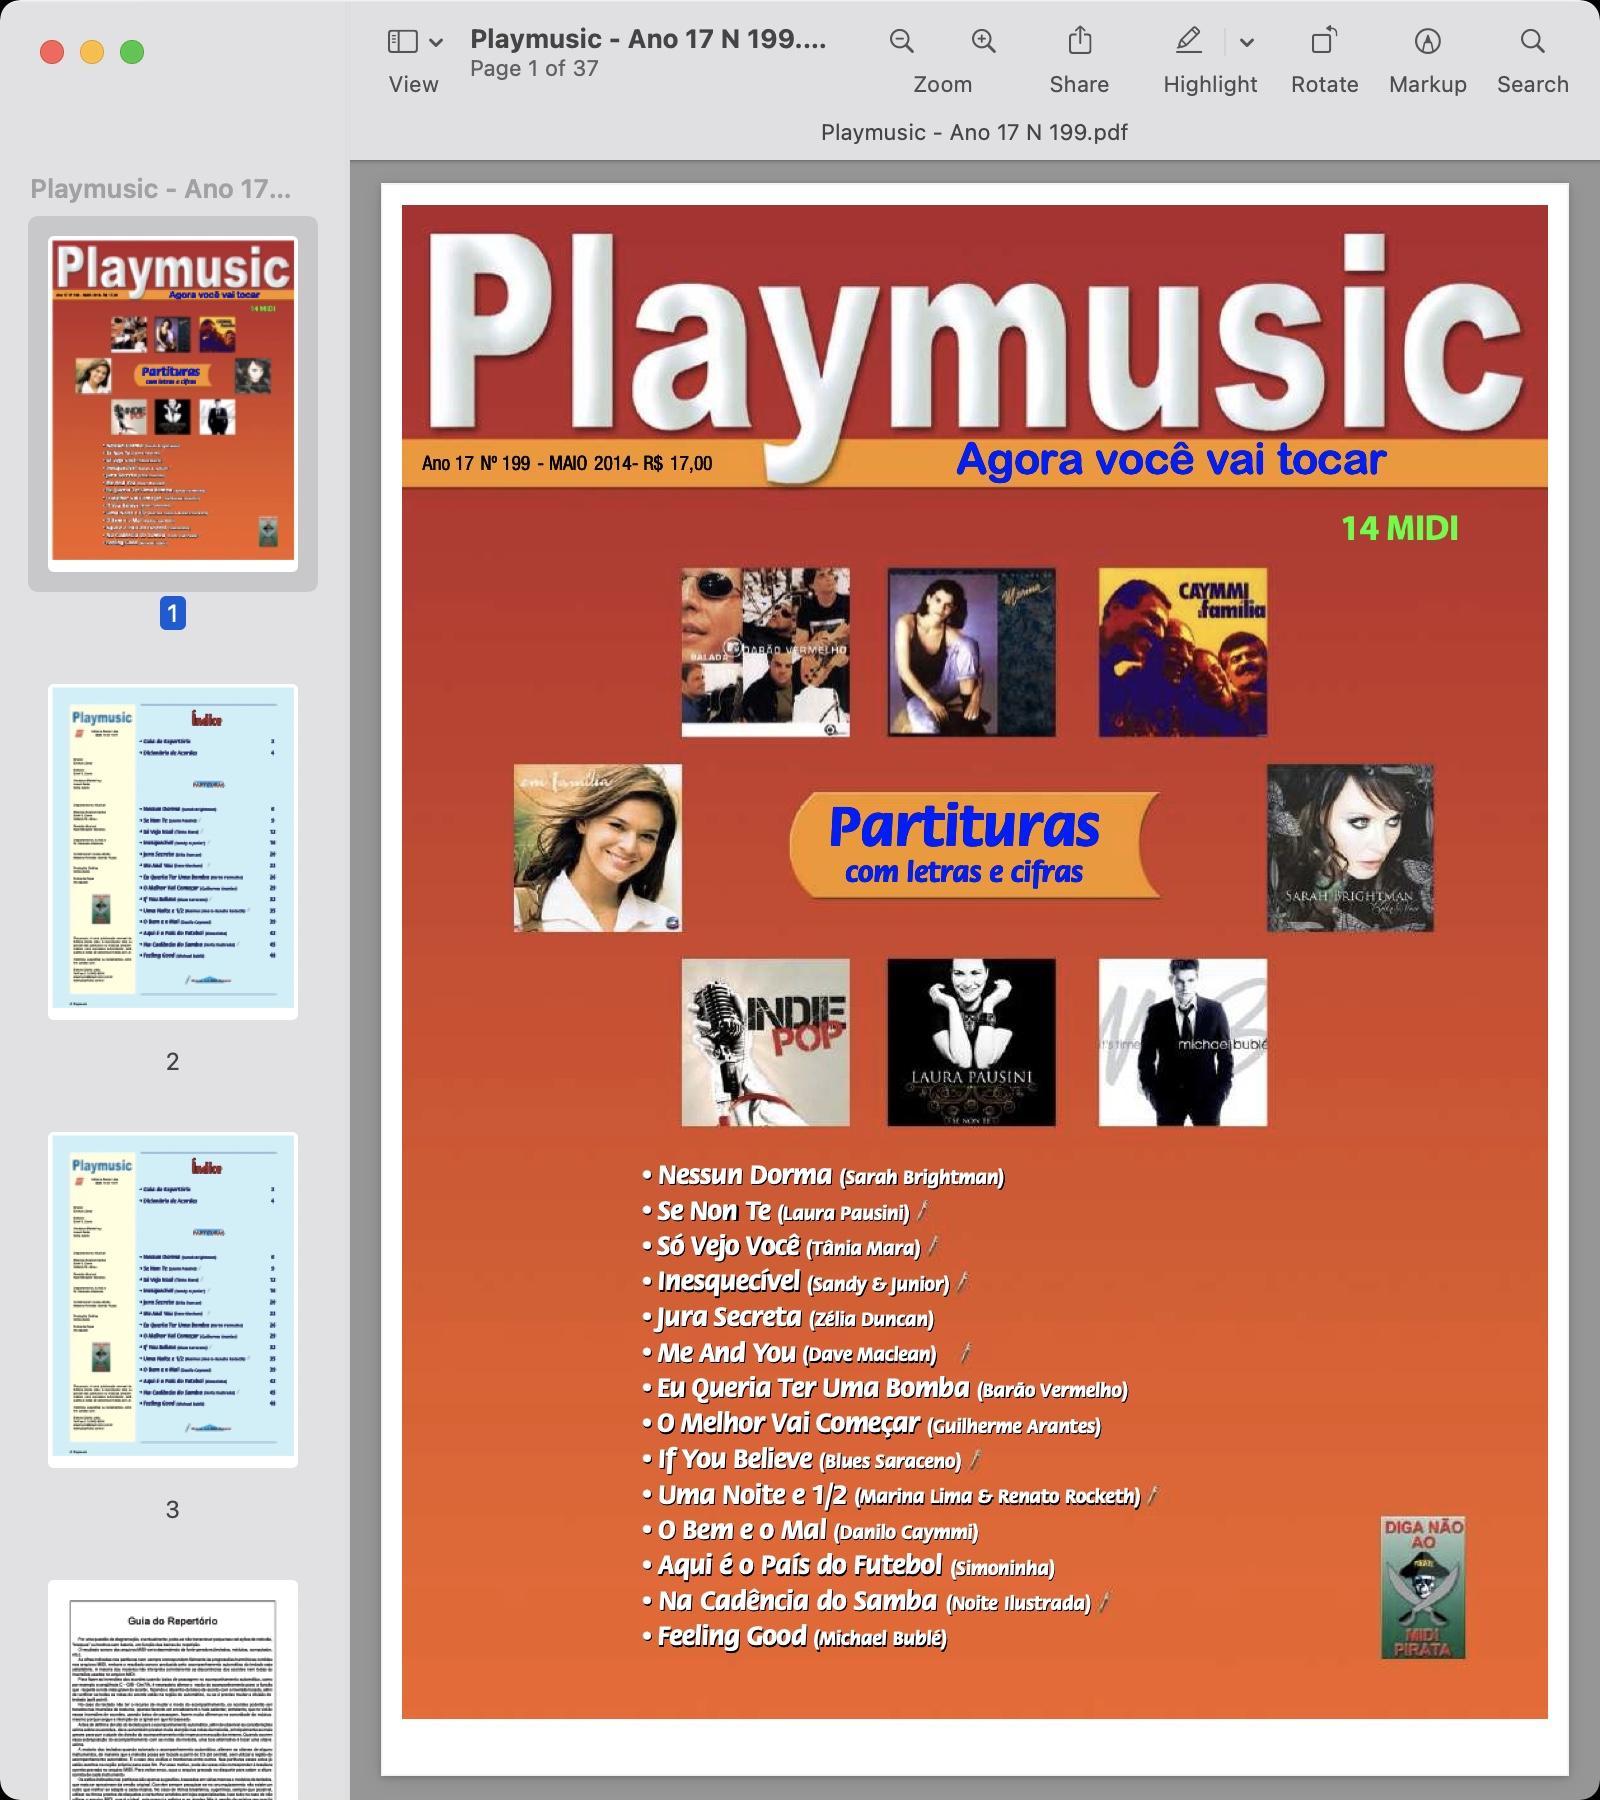 Playmusic - Ano 17 N 199.jpg